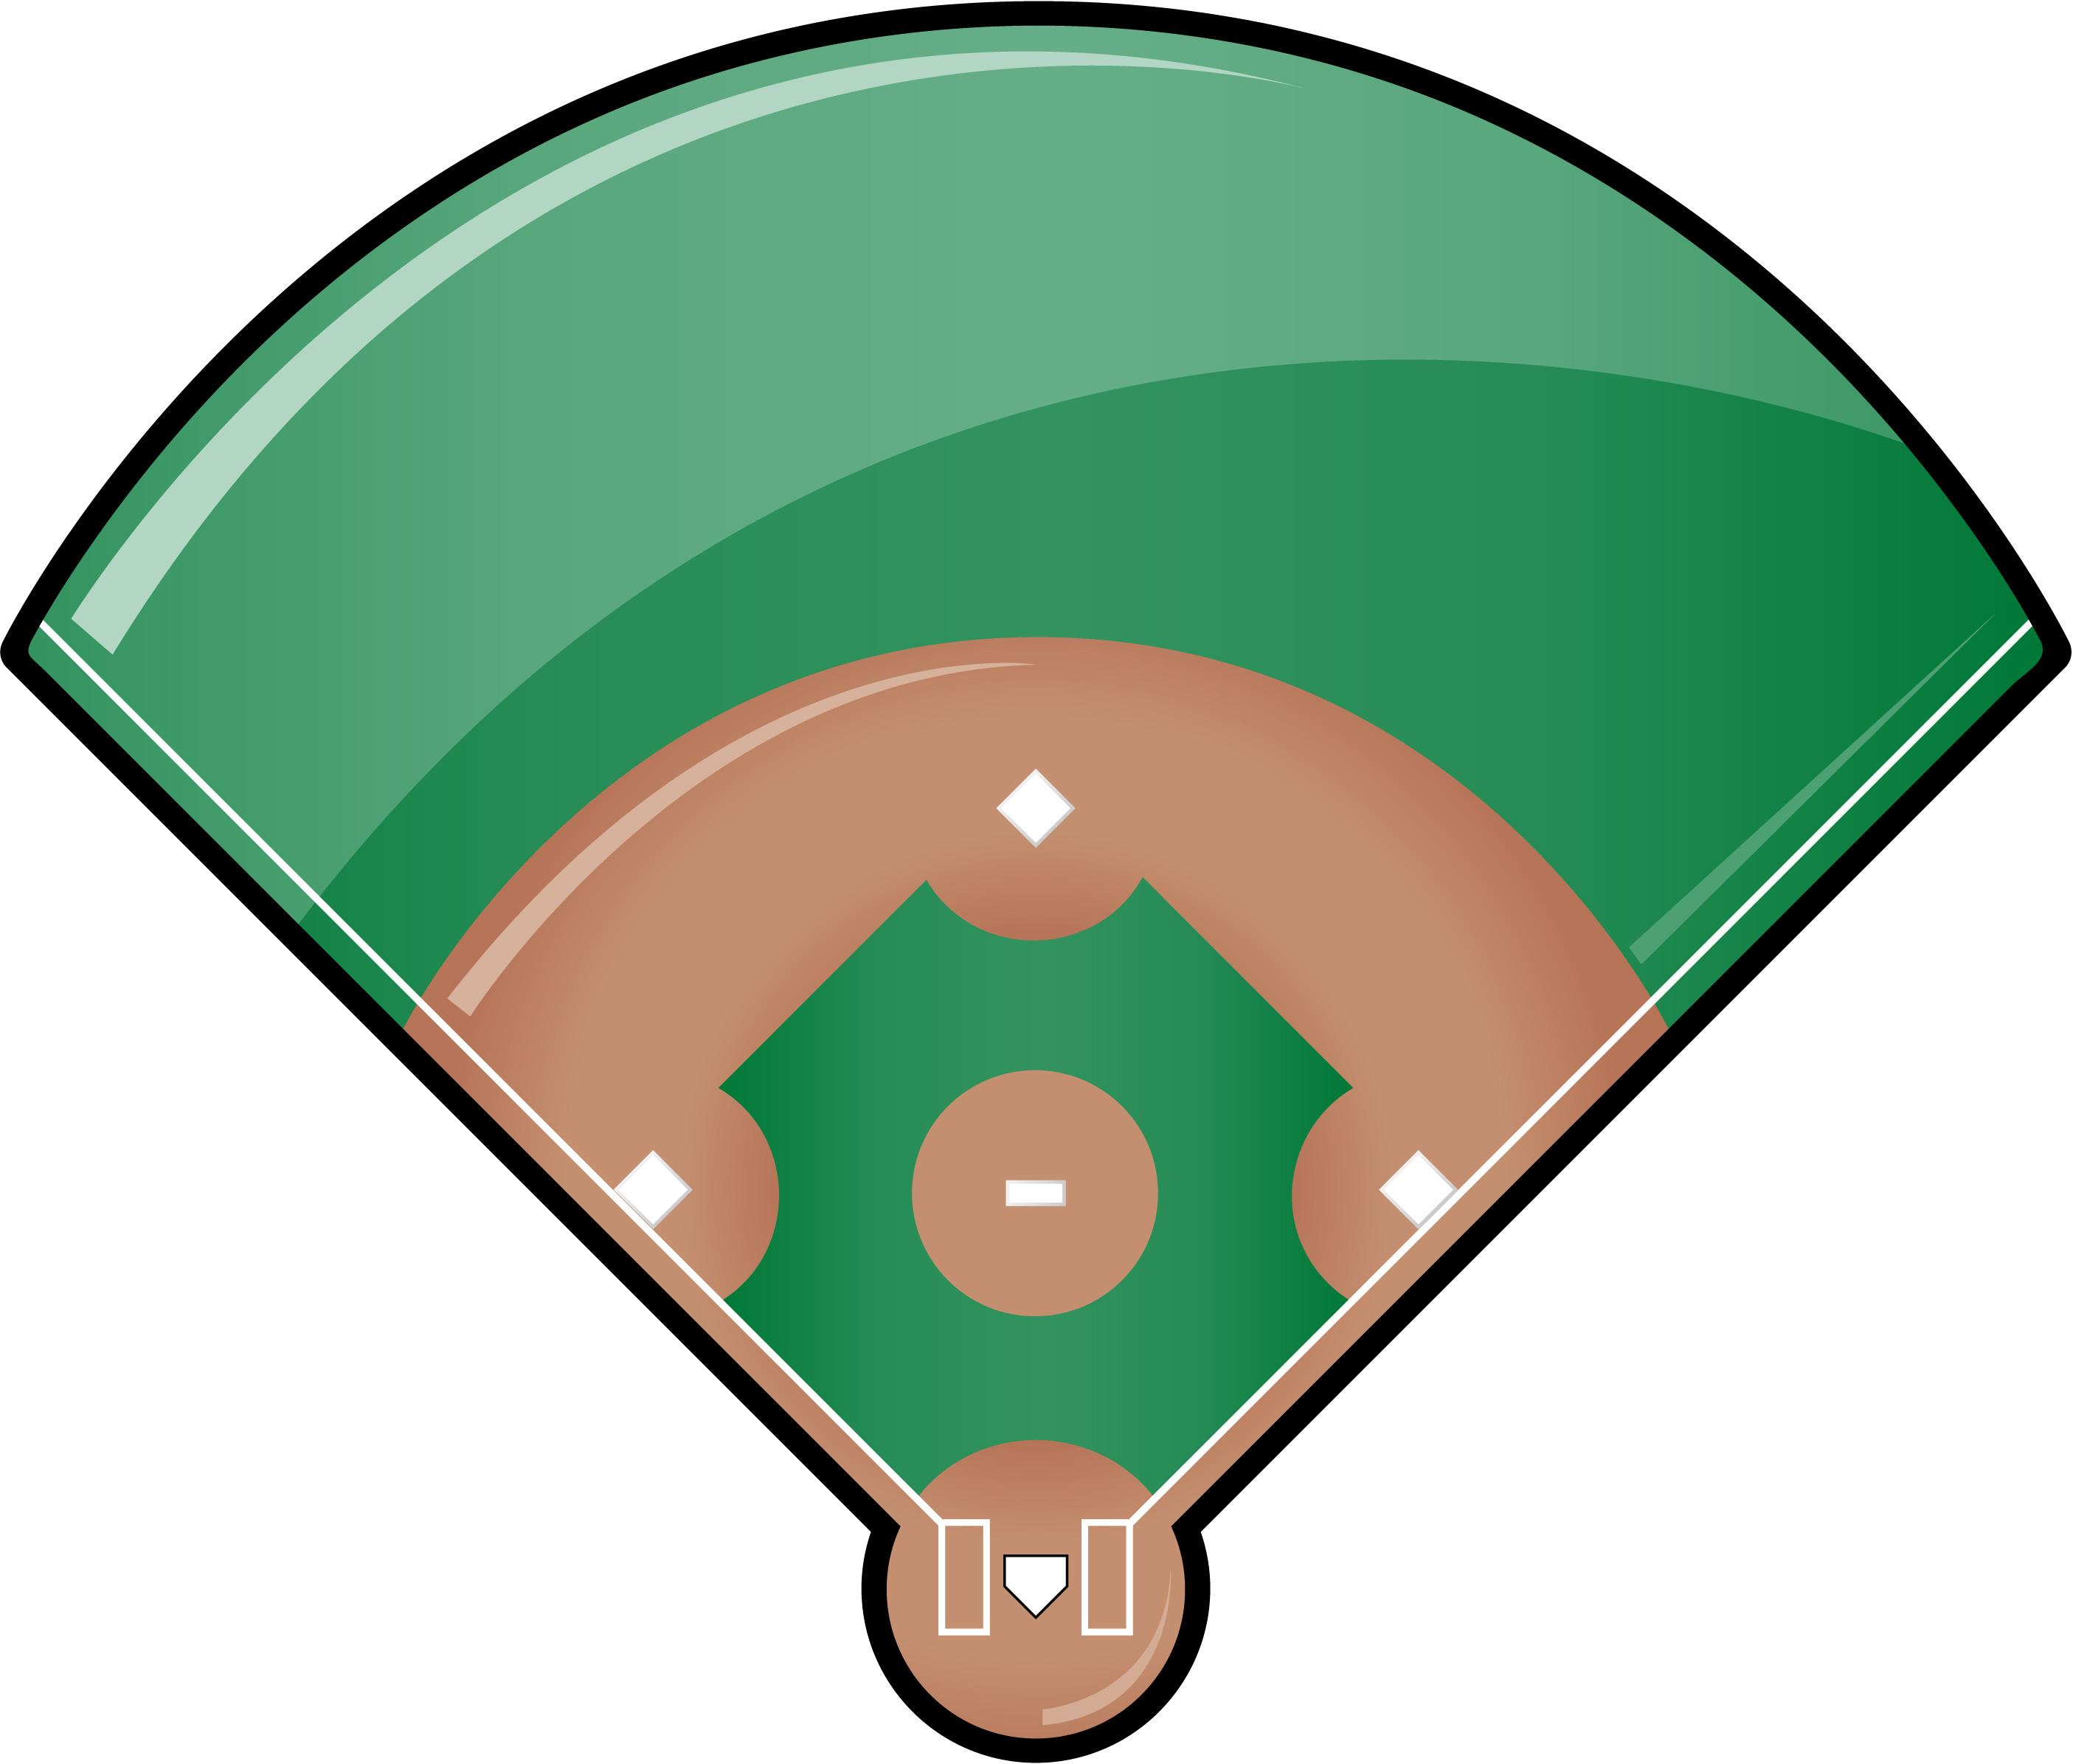 Baseball Field Clipart-baseball field clipart-4